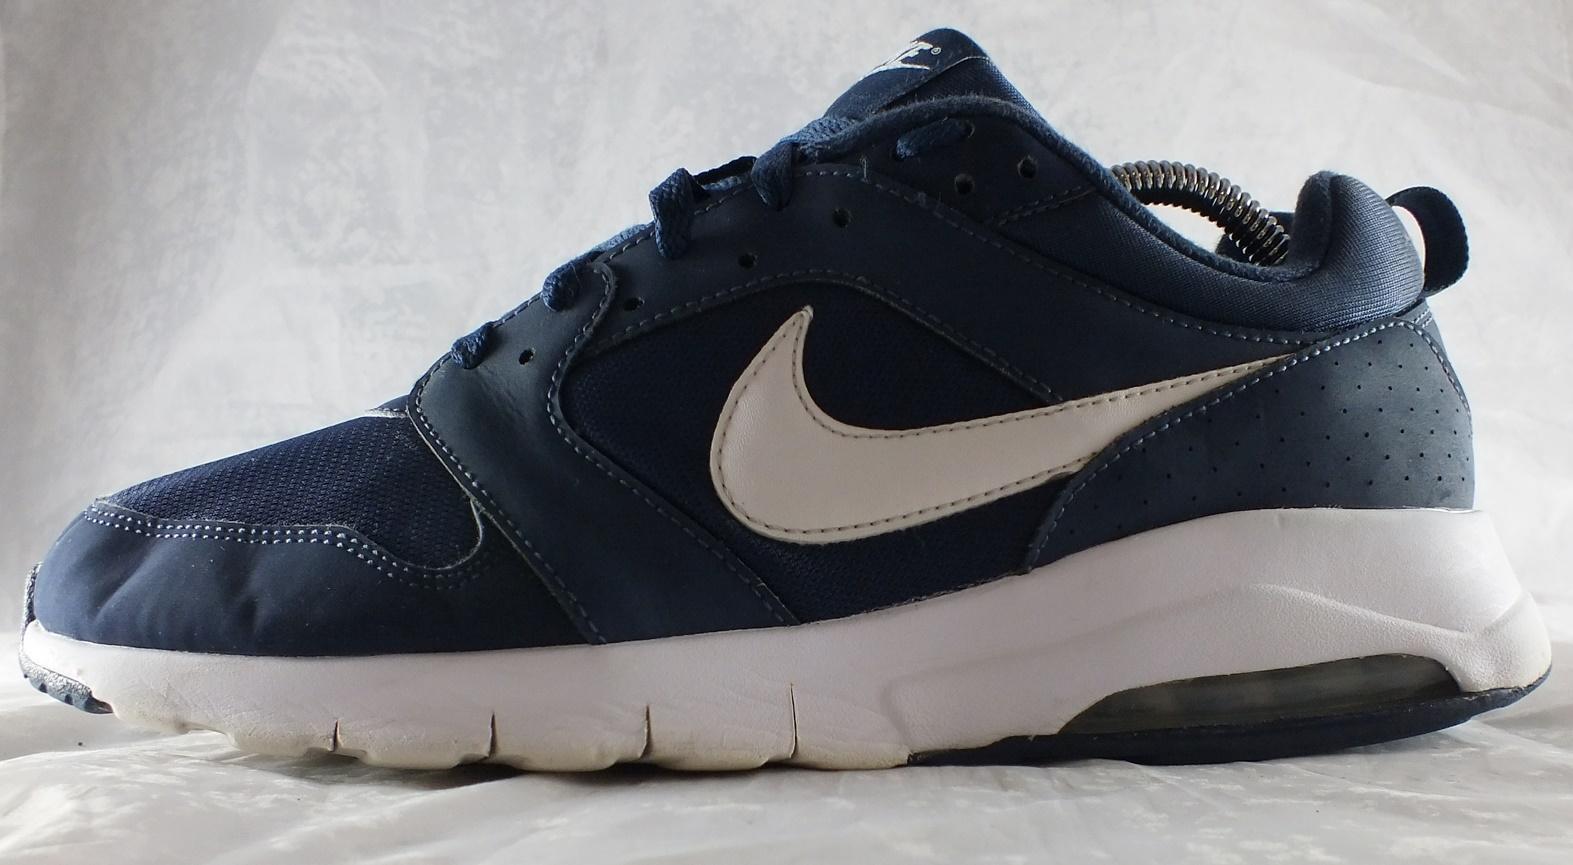 hot sale online 4c7f9 52673 Nike Air Max Motion Buty Sportowe rozm. 45